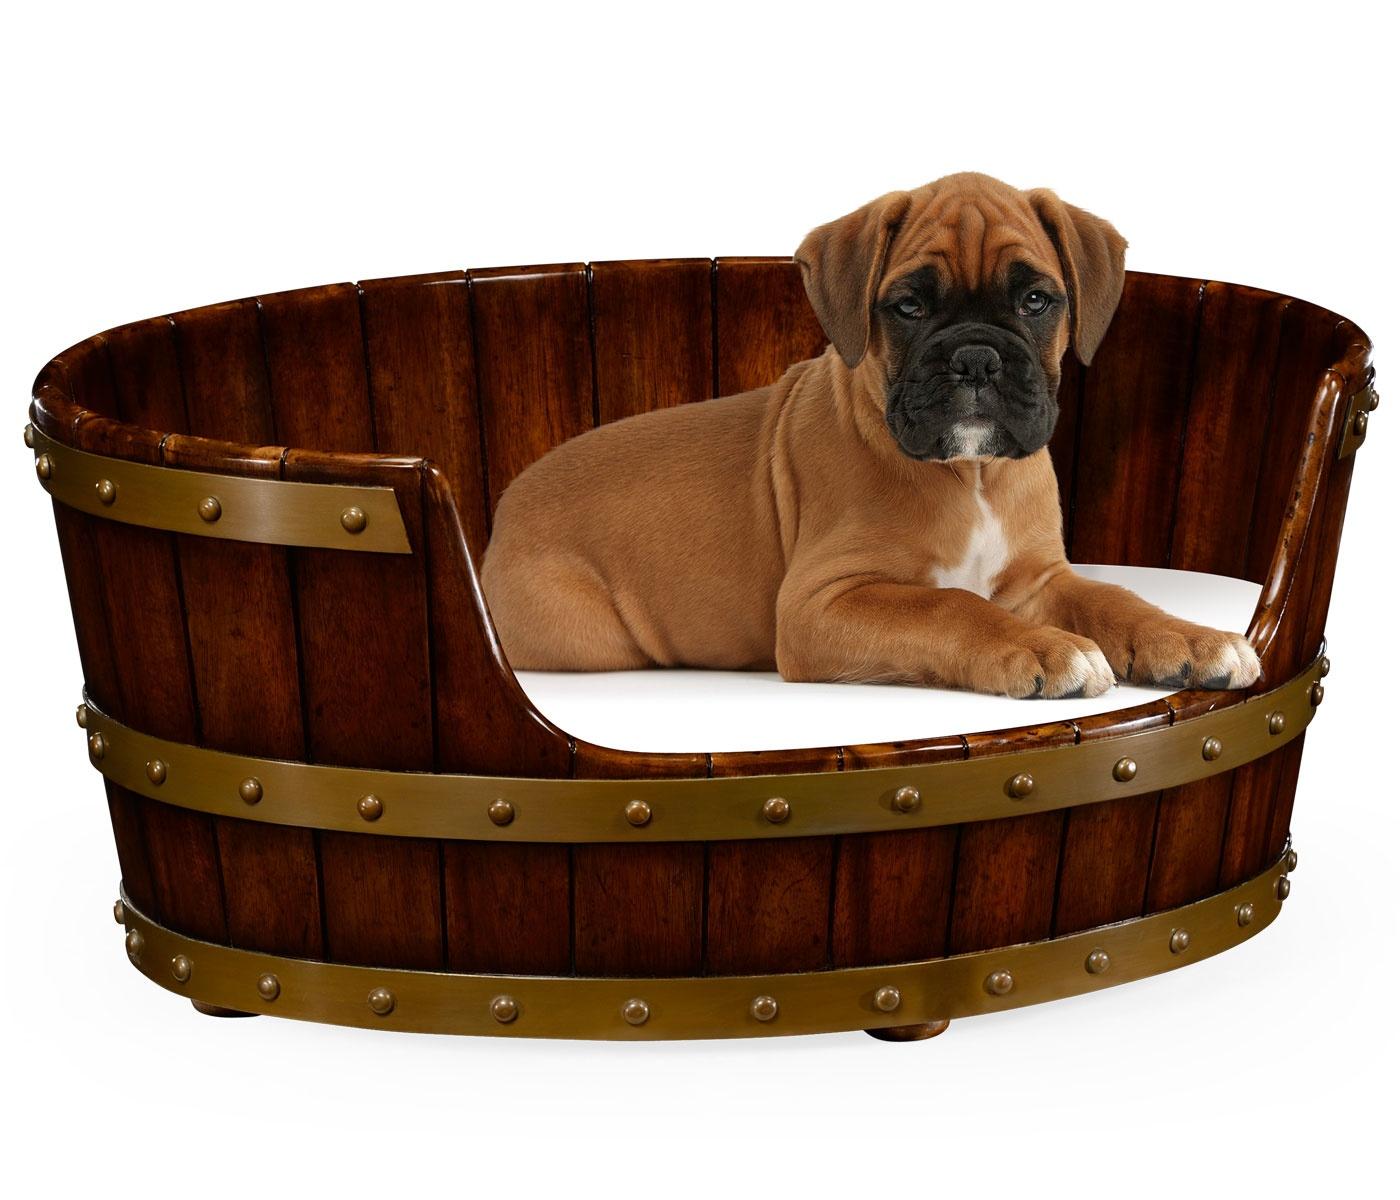 luxury dog bed medium size 28 39 39 swanky interiors. Black Bedroom Furniture Sets. Home Design Ideas